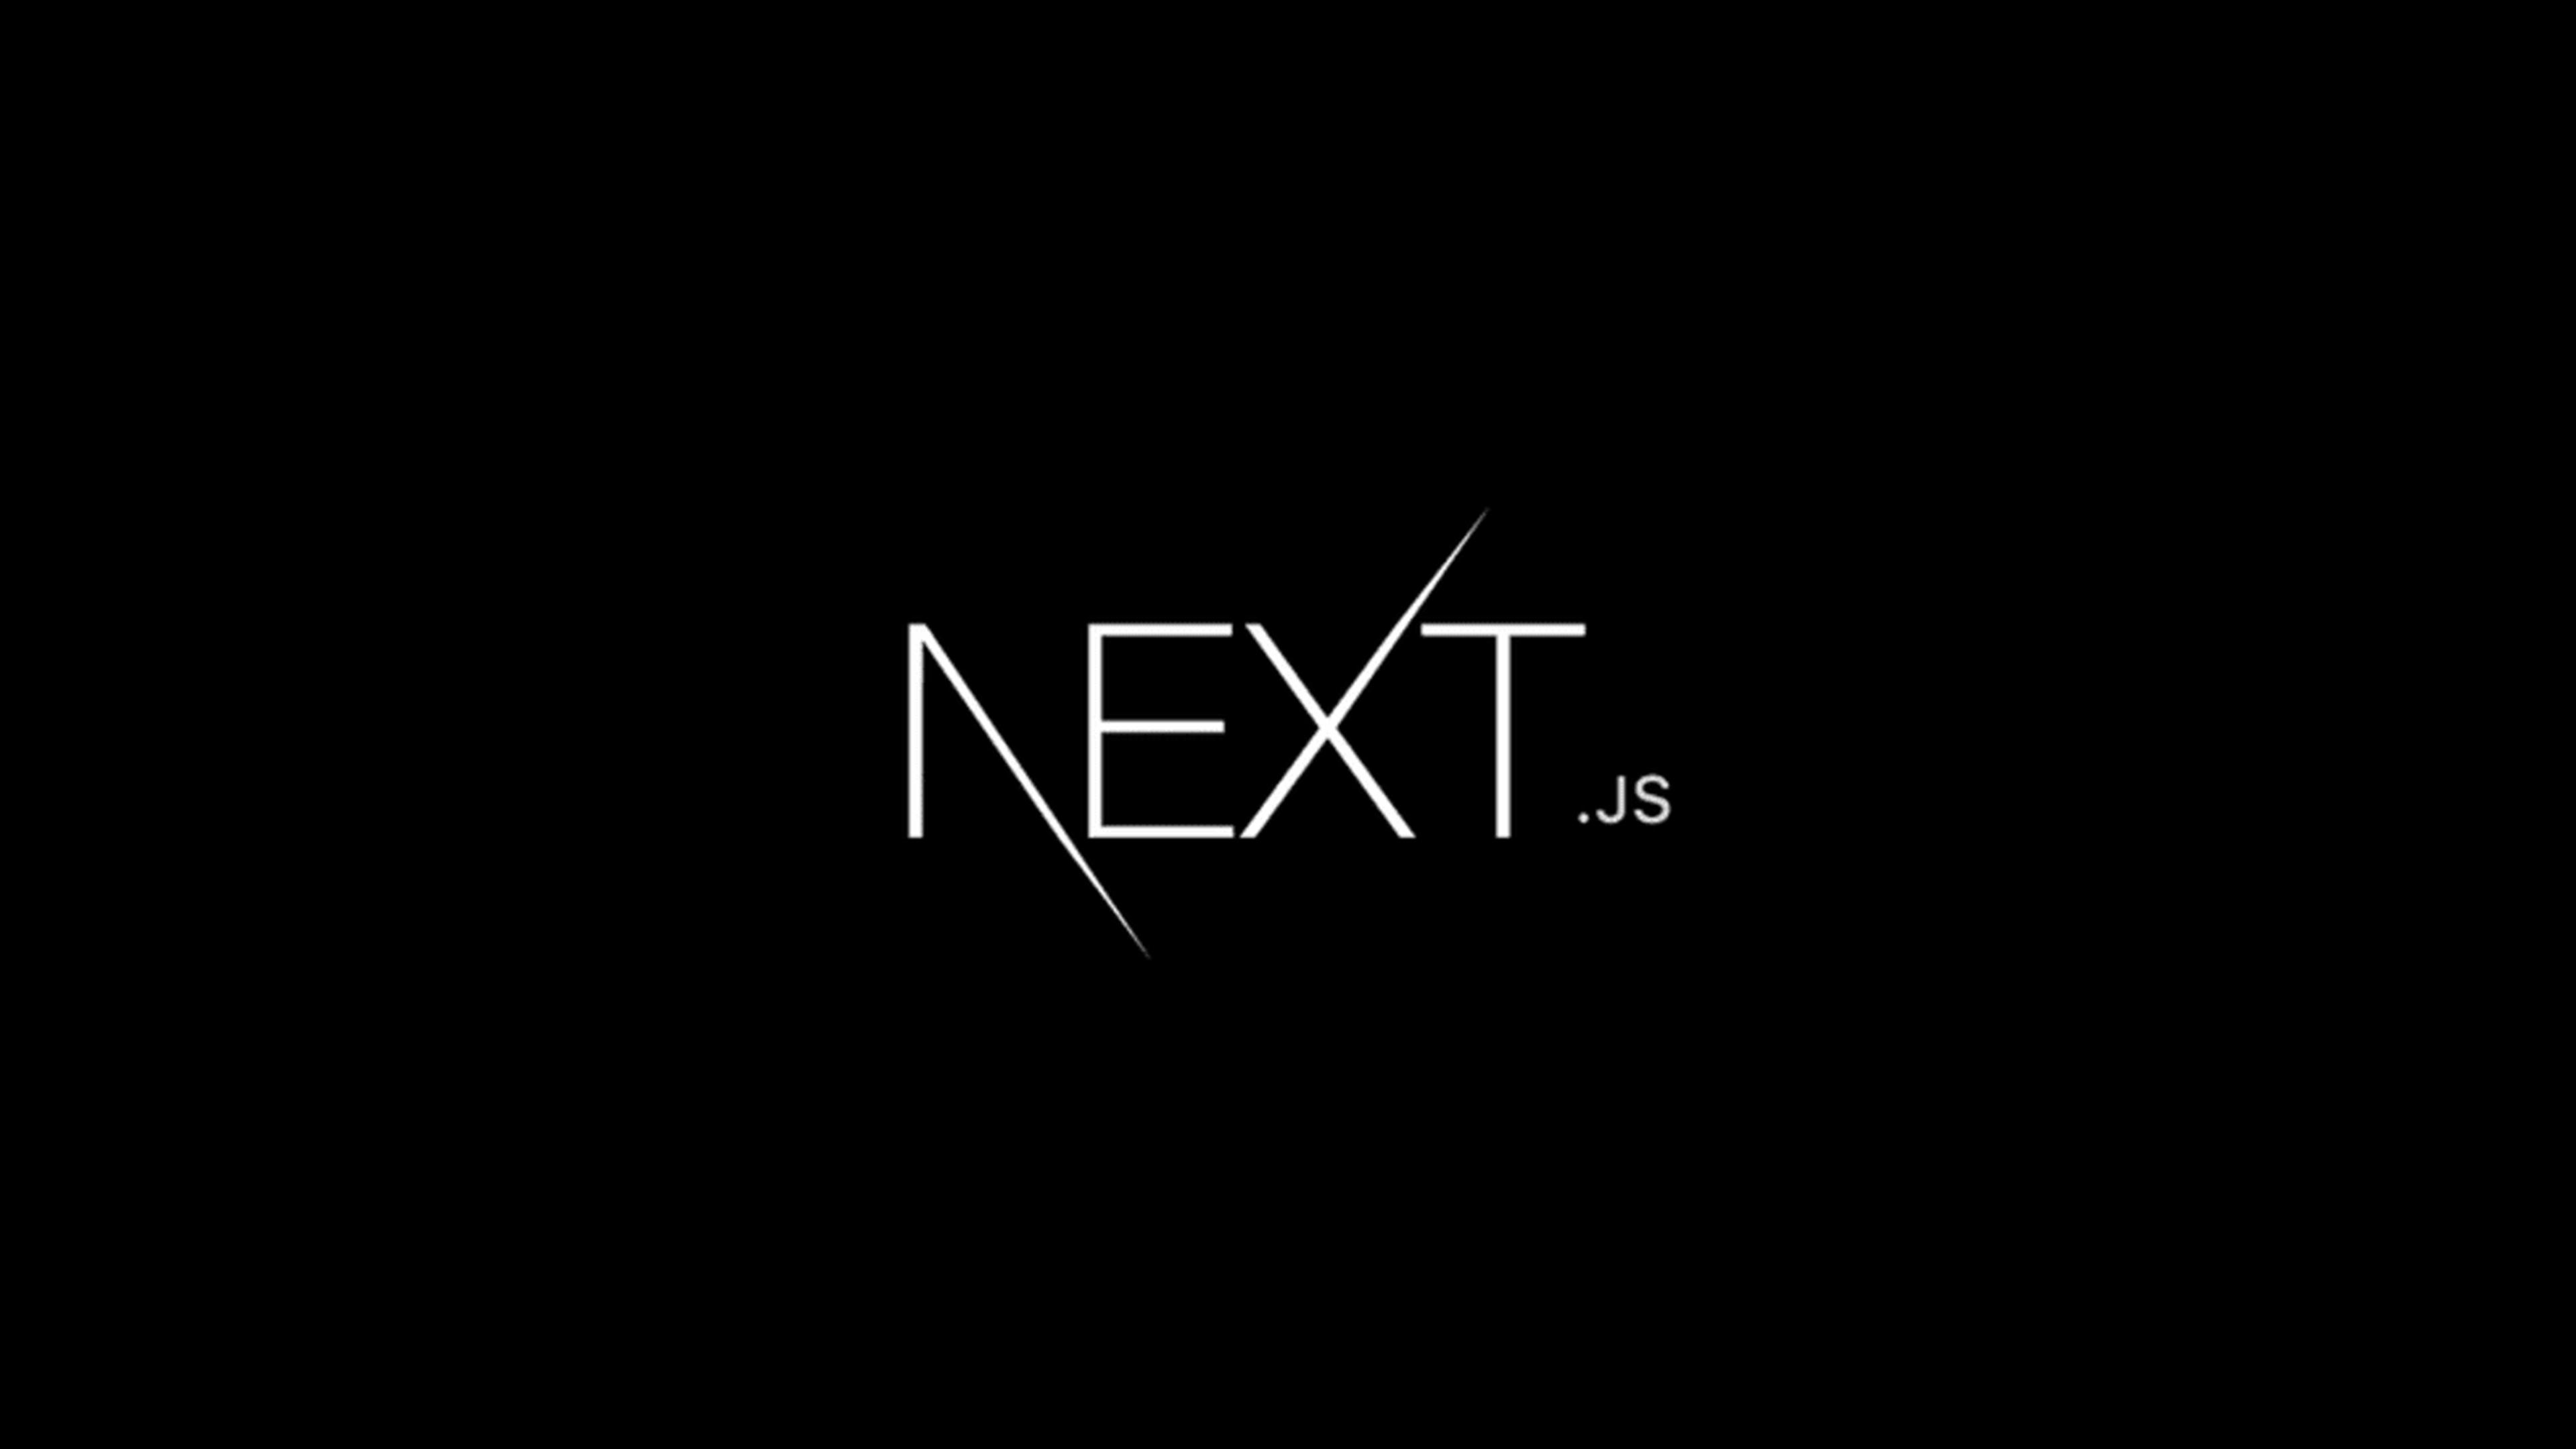 Next js logo